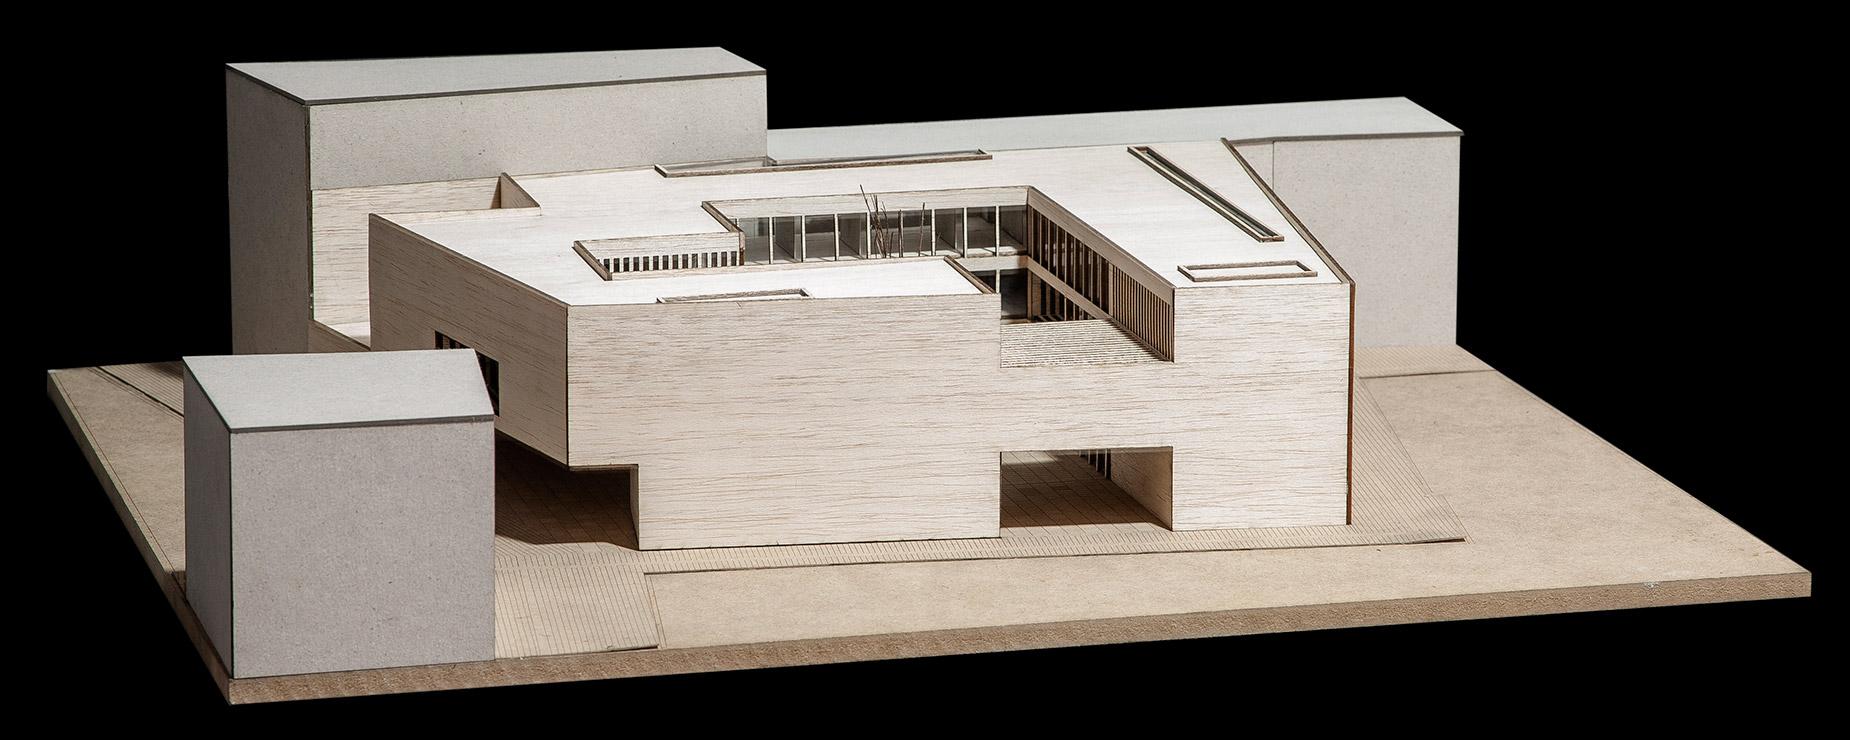 maqueta-arquitectura-architecture model-valencia-maqueta pfc-ETSAV-Biblioteca-arquimaqueta (1)